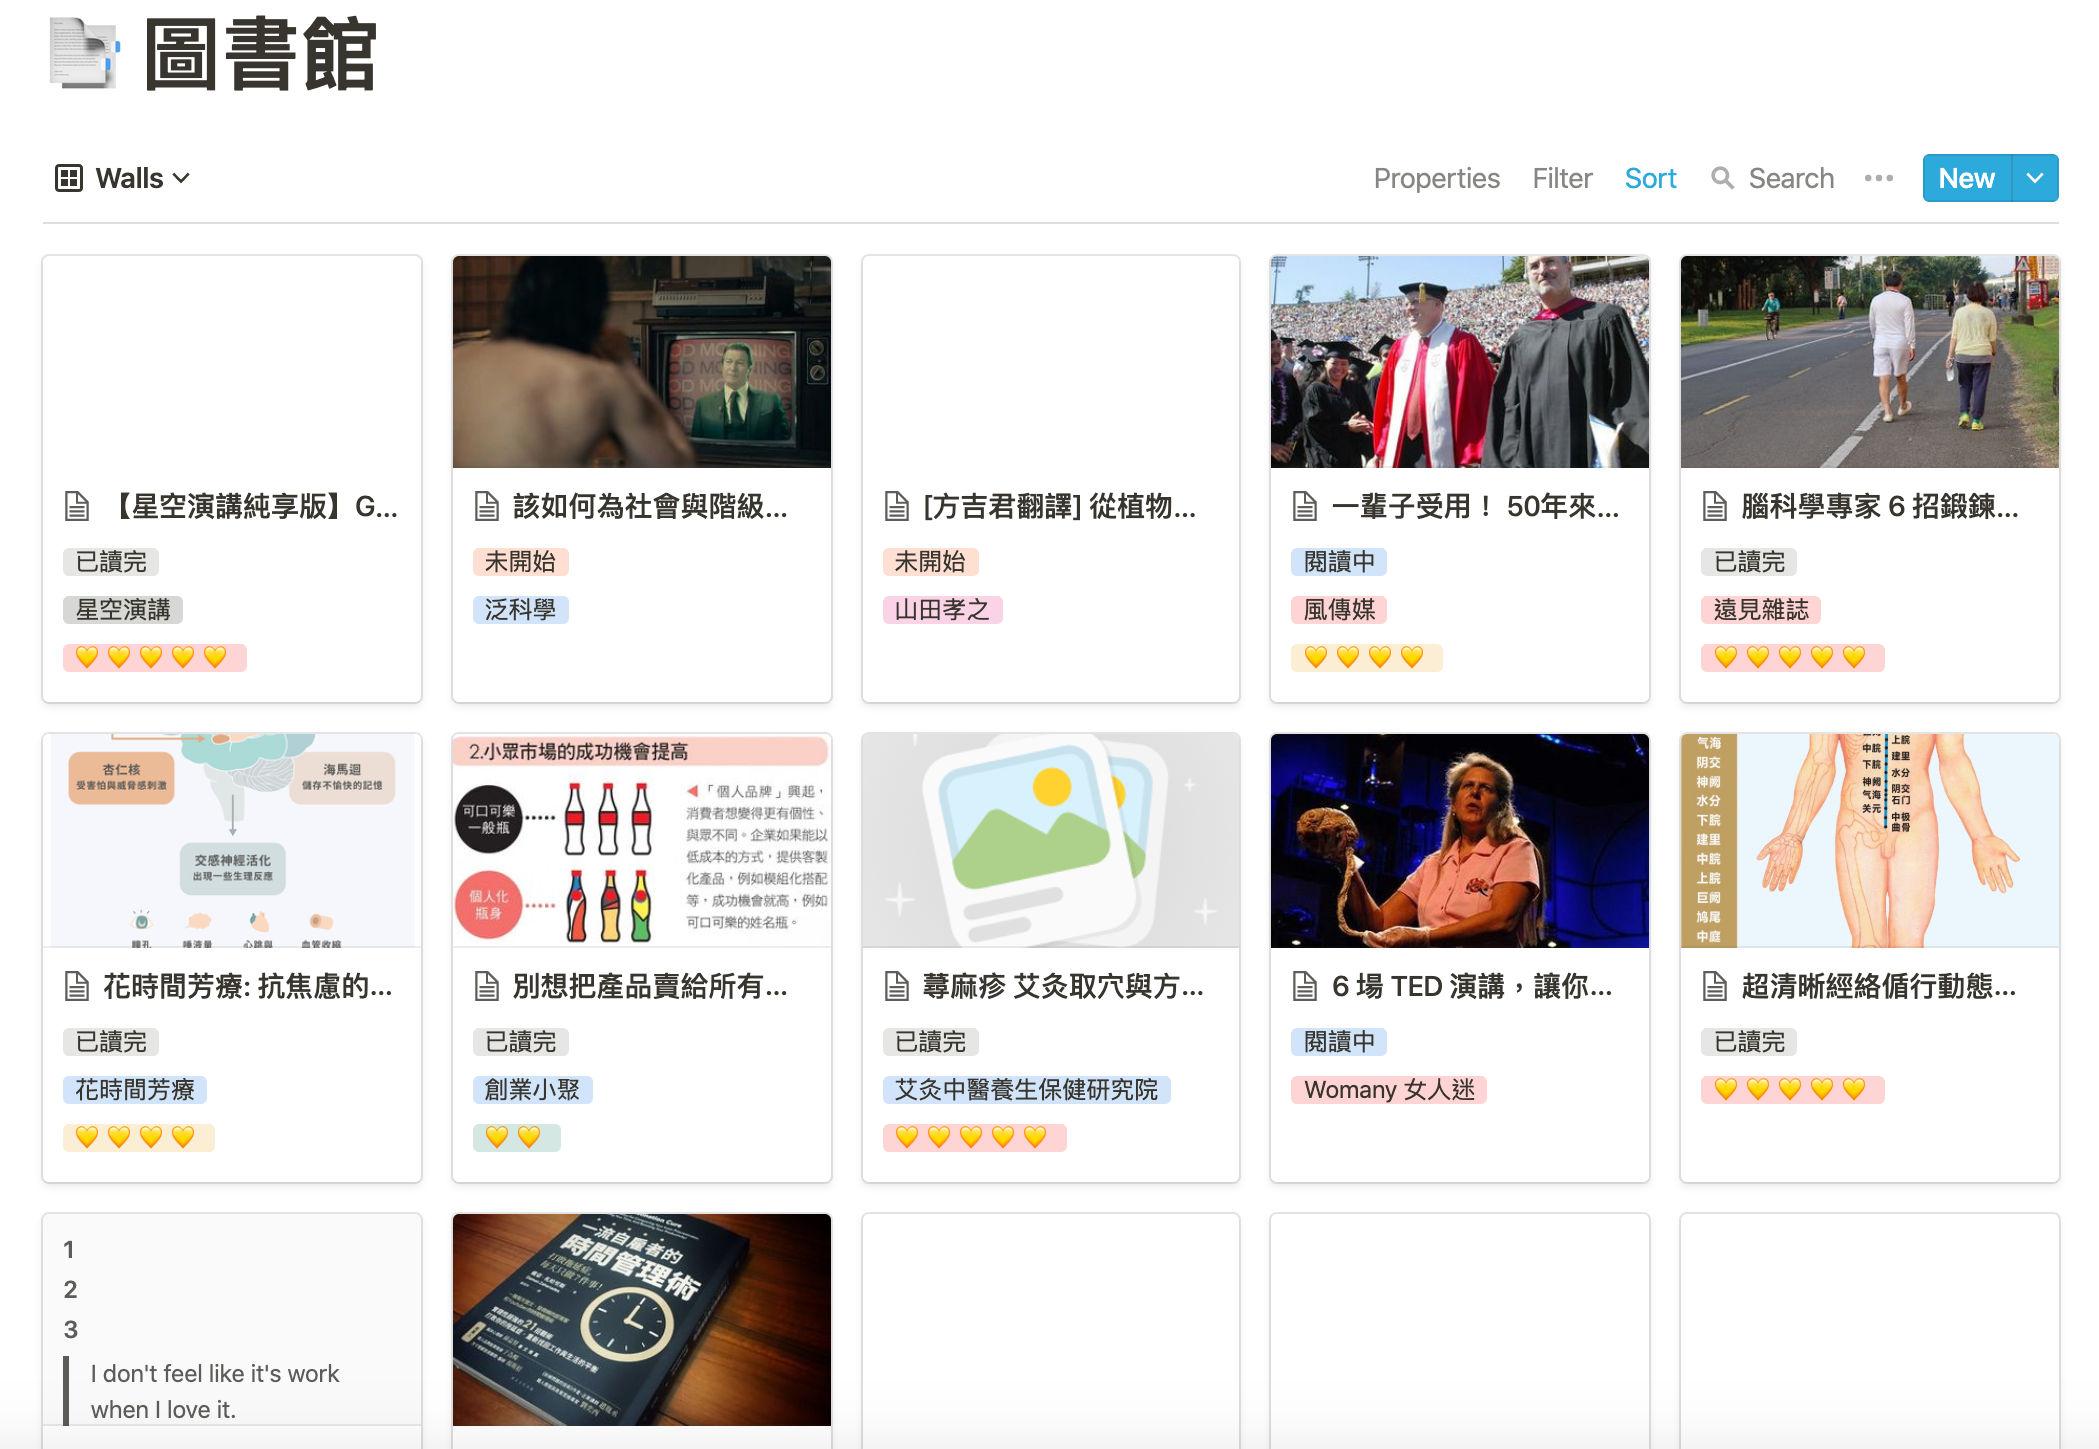 https://ik.imagekit.io/kuenwei/willliu_me/___2020-01-24___11.04.07_cGJ1ppWVy.png